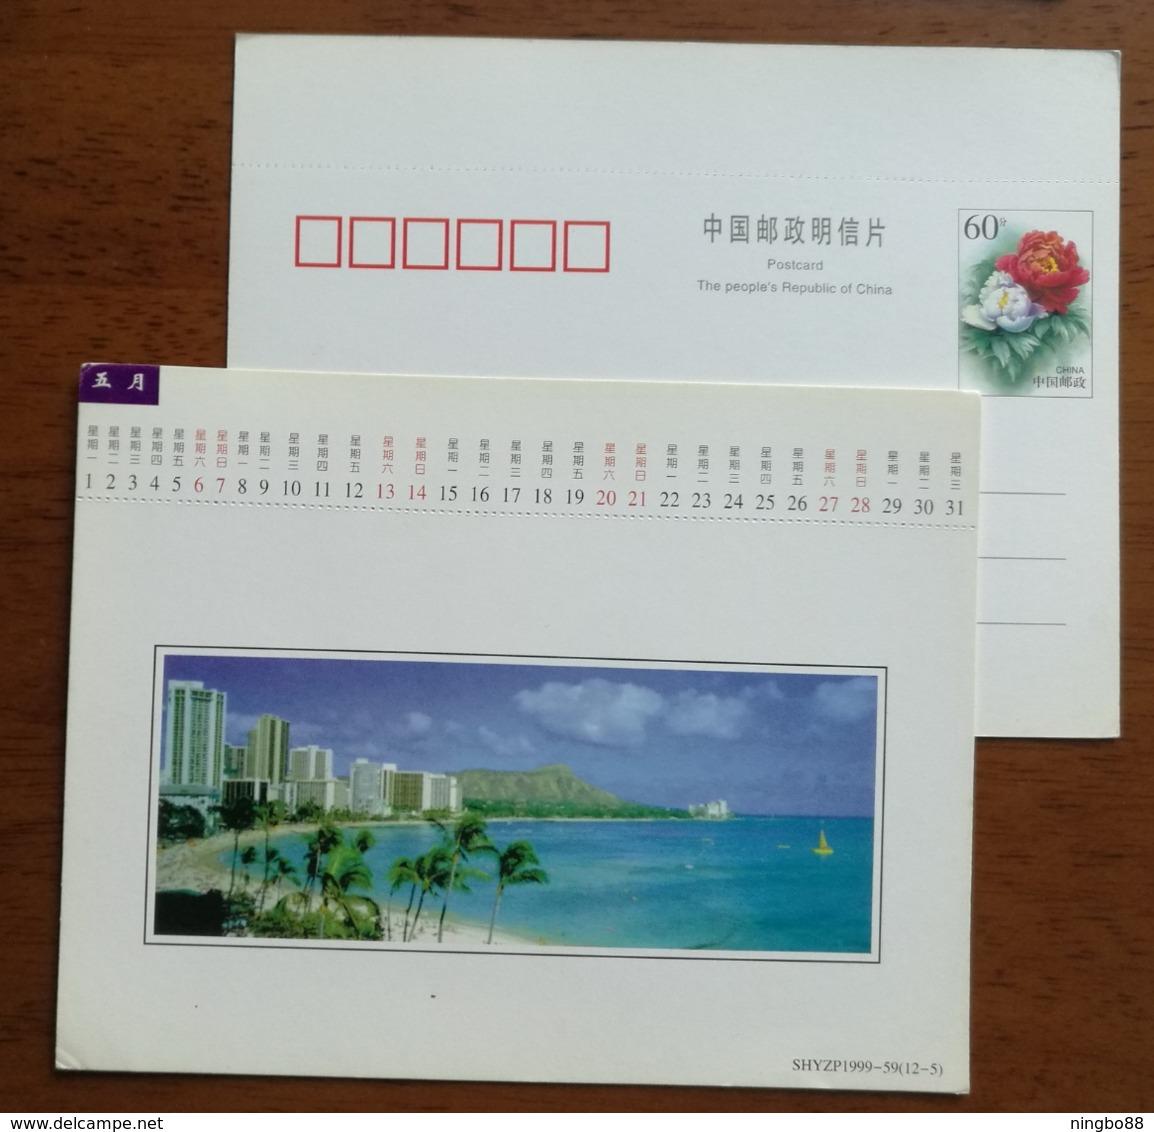 Hawaii Beach,China 1999 Shanghai New Year Calendar Pre-stamped Card - Holidays & Tourism